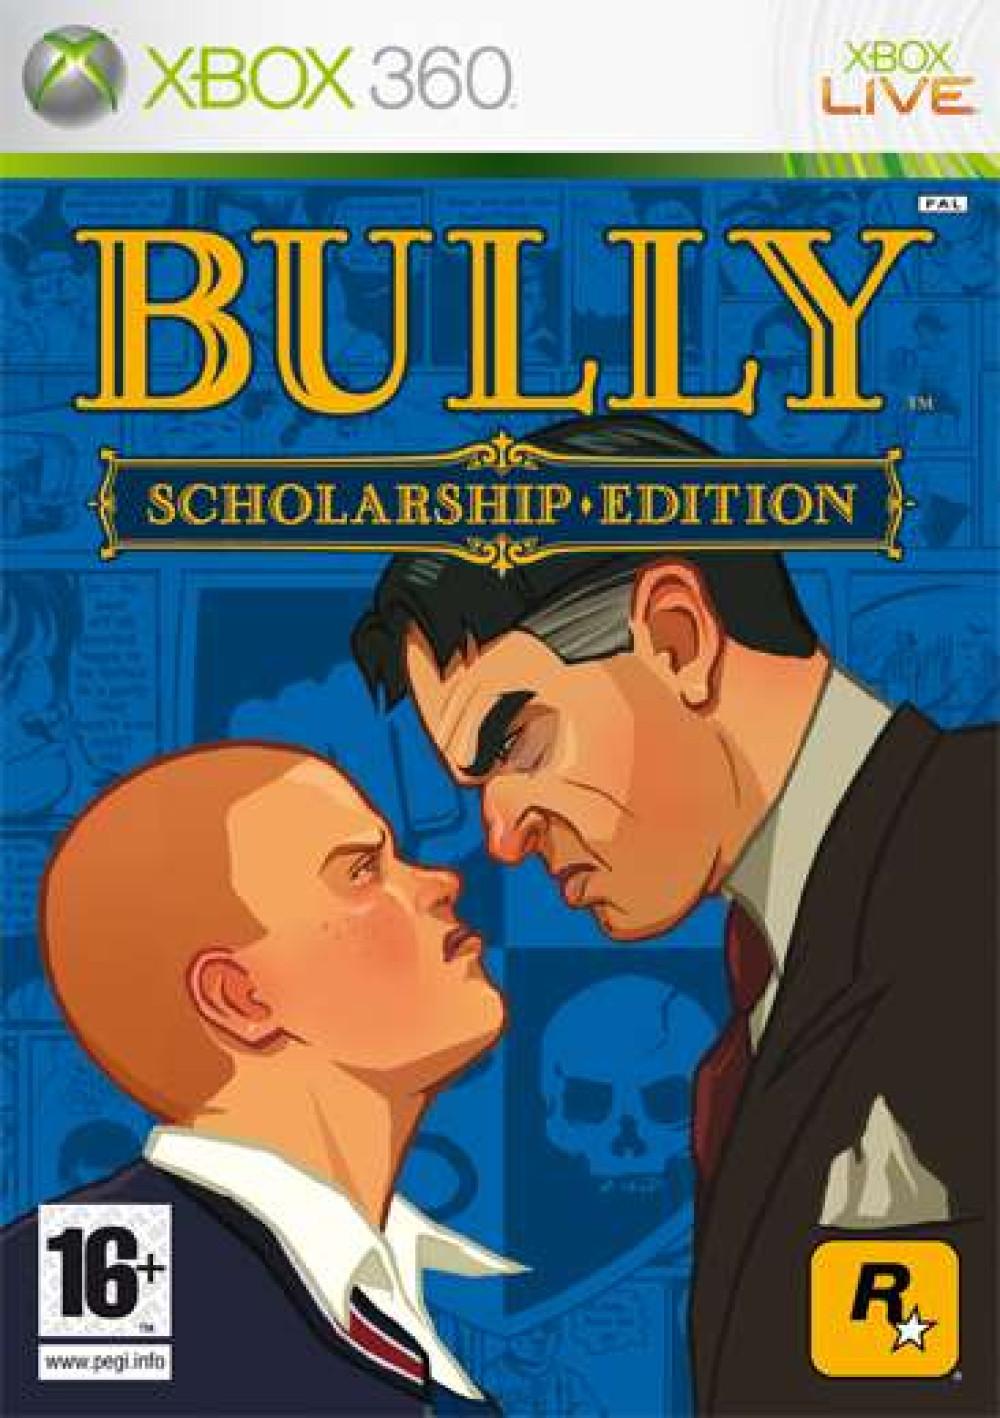 XBOX 360 Bully Scholarship Edition